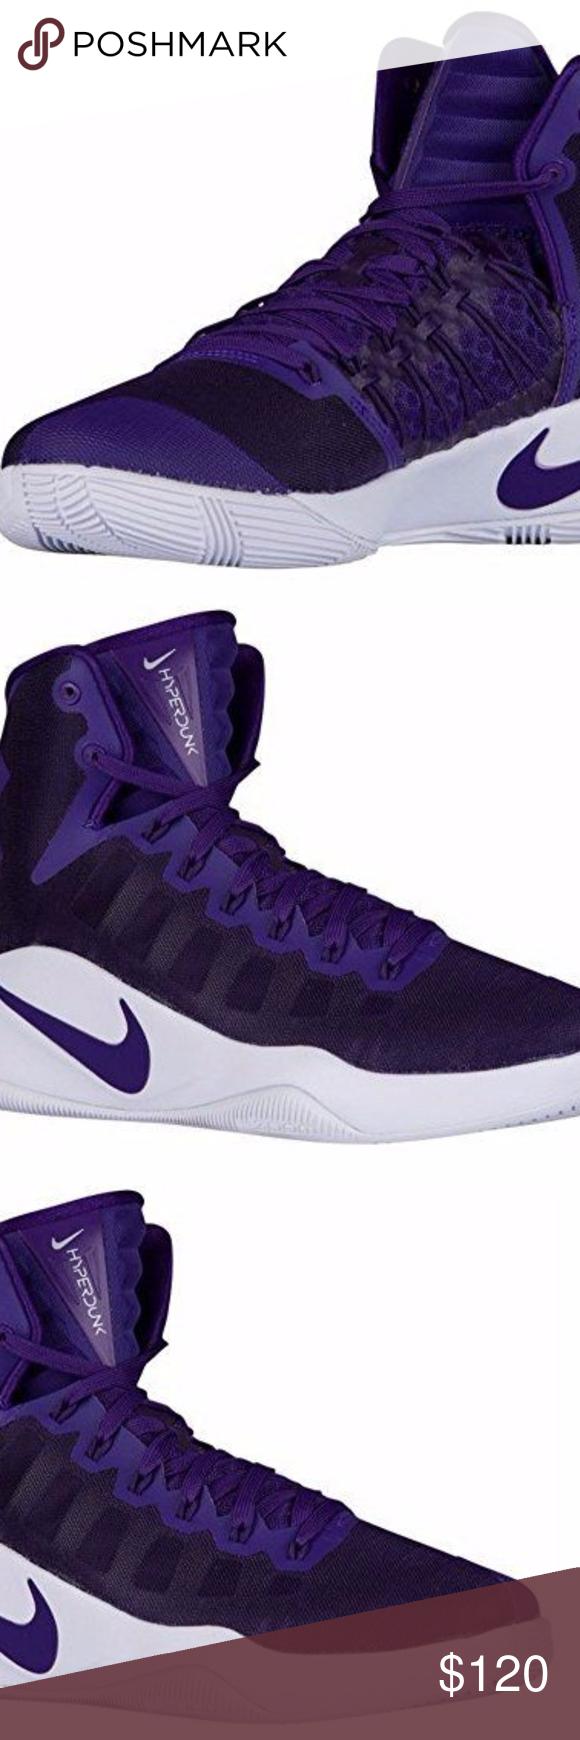 55c300a8c2b Nike Women s Basketball Shoes Hyper Dunk Hyperdunk Nike Women s Basketball  Shoes Hyper Dunk Hyperdunk 2016 TB Purple Size 8 The Nike Hyperdunk 2016  (Team) ...